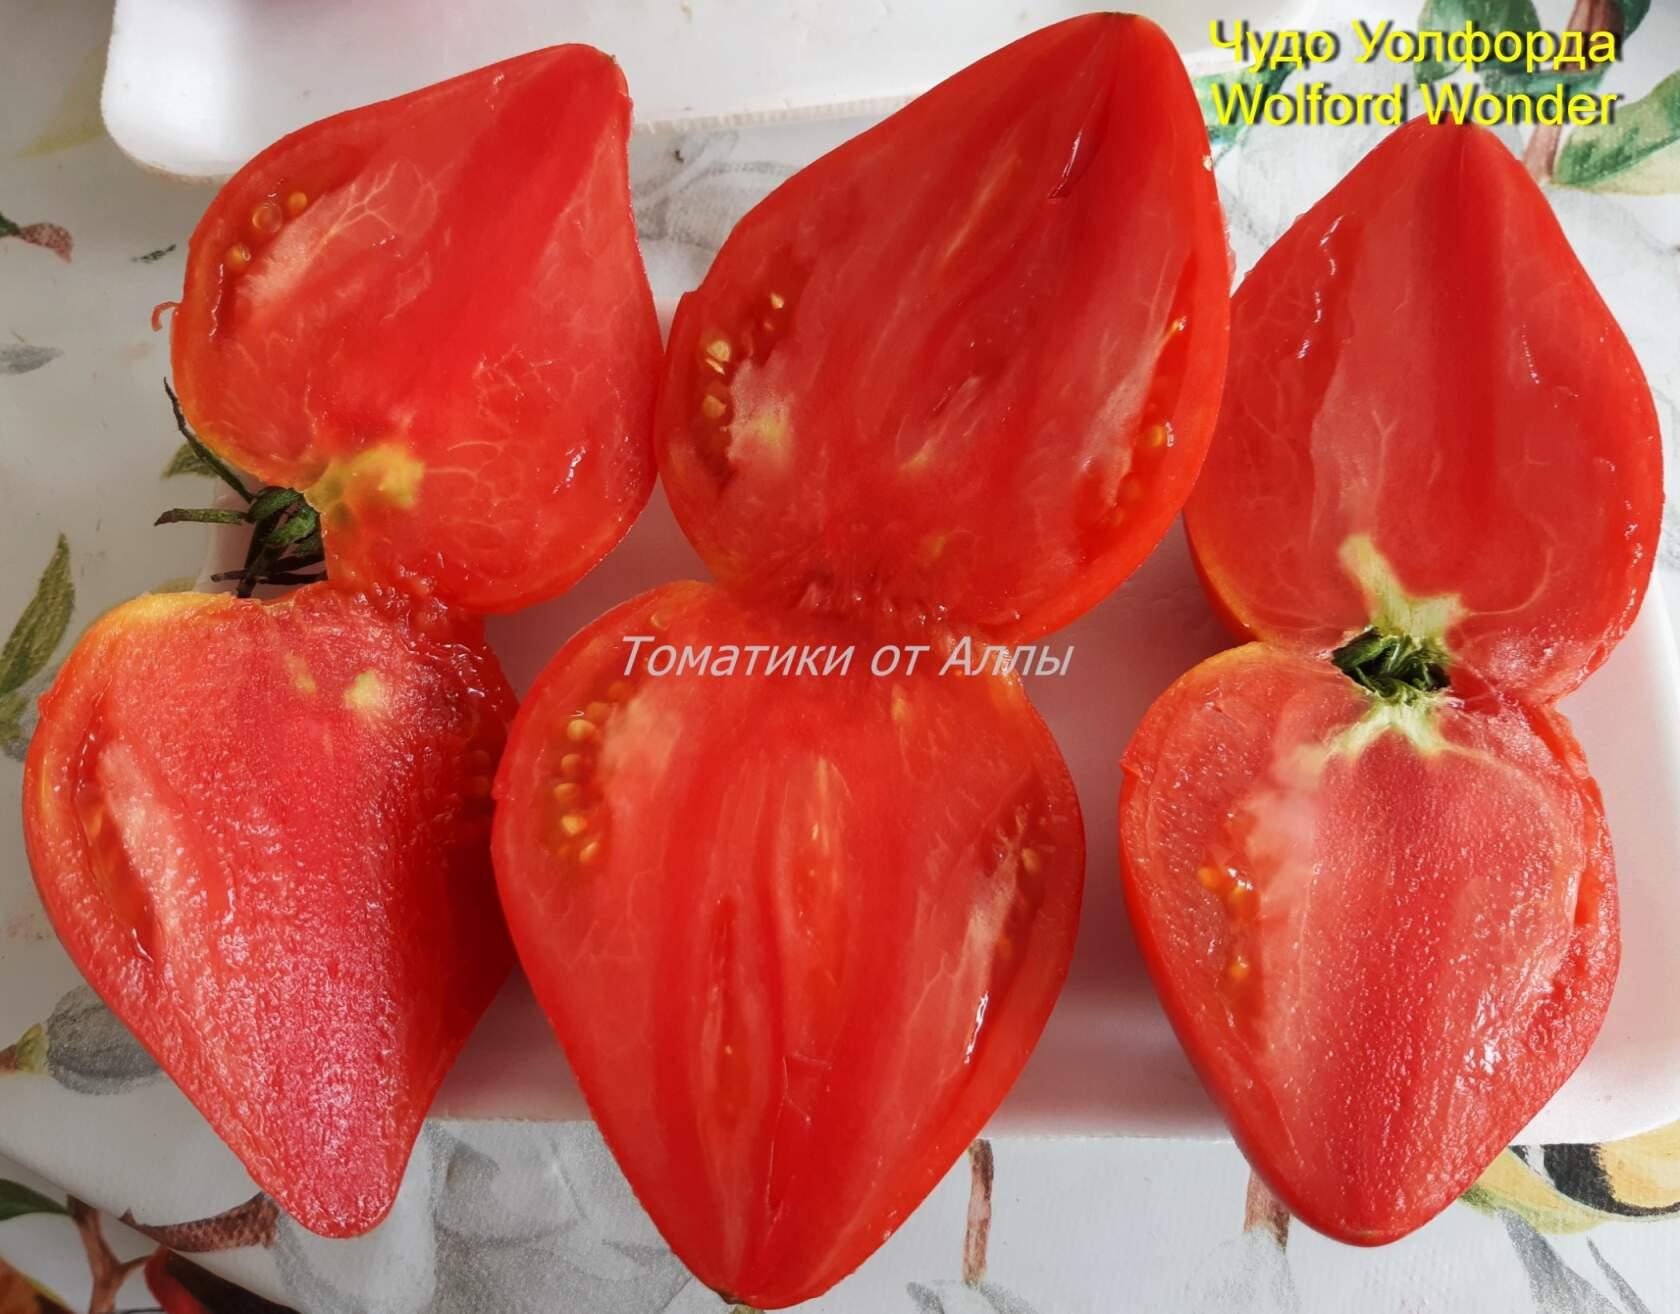 помидоры чудо уолфорда фото отзывы